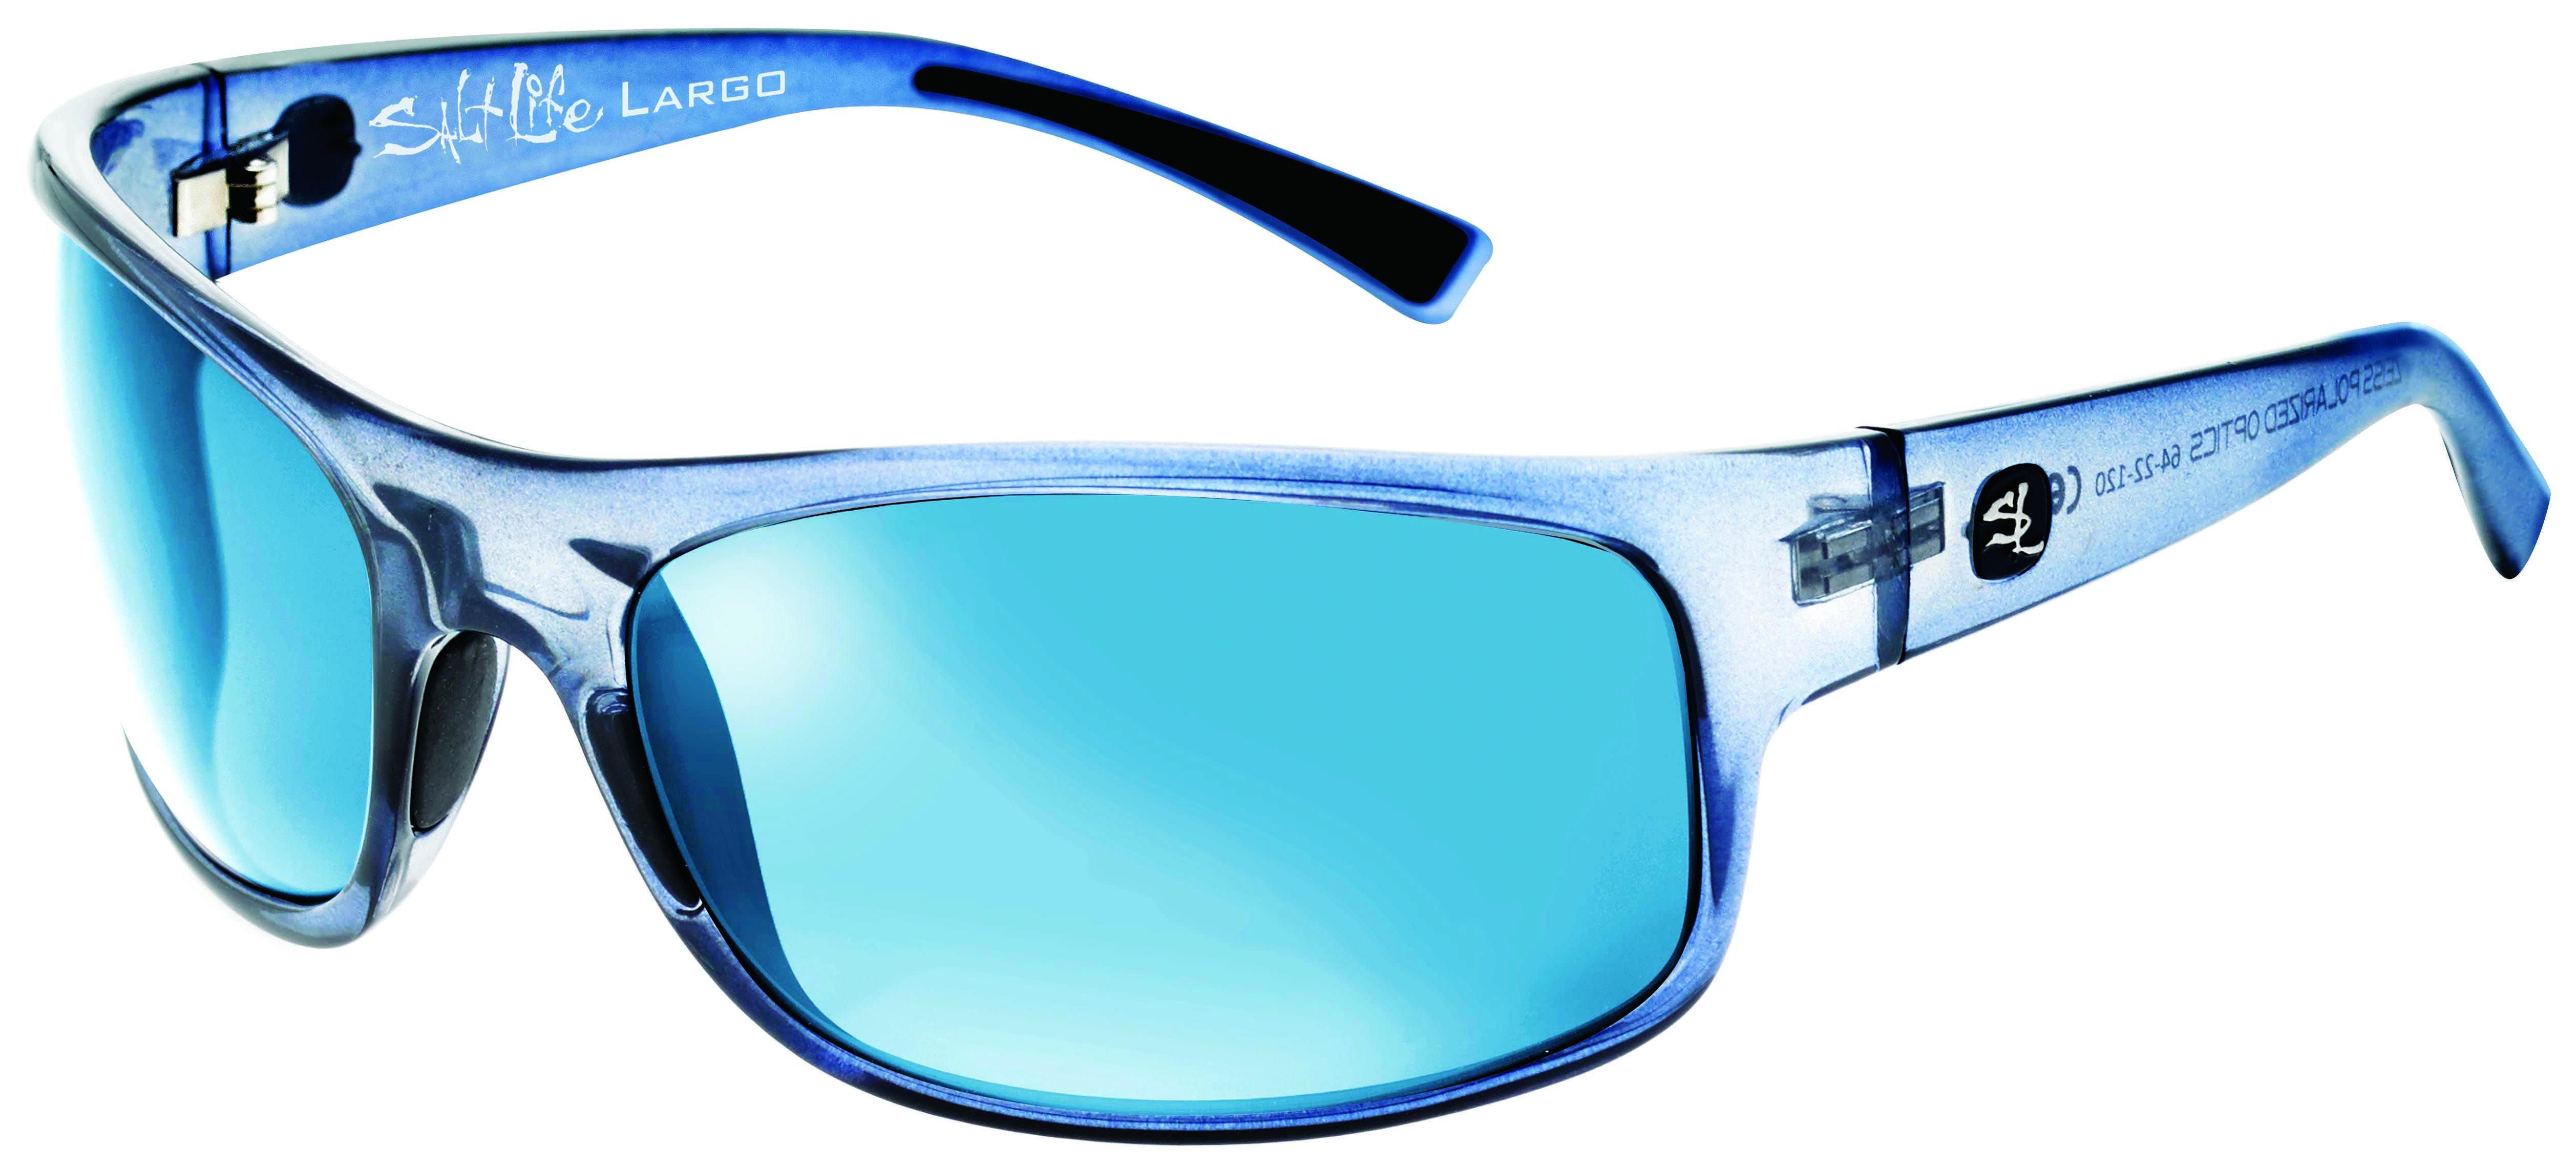 Custom Made Eyeglass Frames New York : Salt Life Sport Optics Coastal Angler & The Angler Magazine